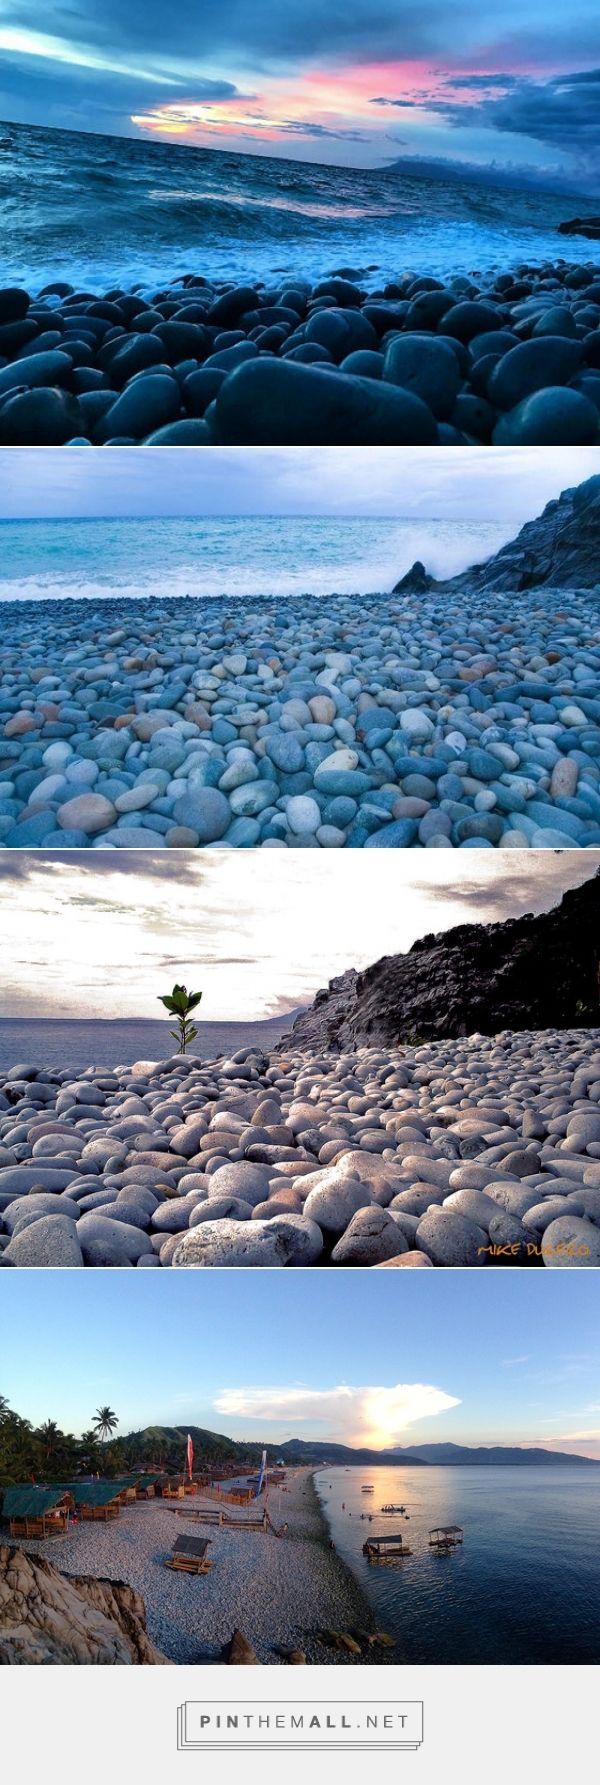 Pebble beaches-Surigao City, Surigao del Norte  Mabua Pebble Beach, a kilometer-long shore composed of smooth stones. The stones are mostly white, … | Pinteres… - created via https://pinthemall.net